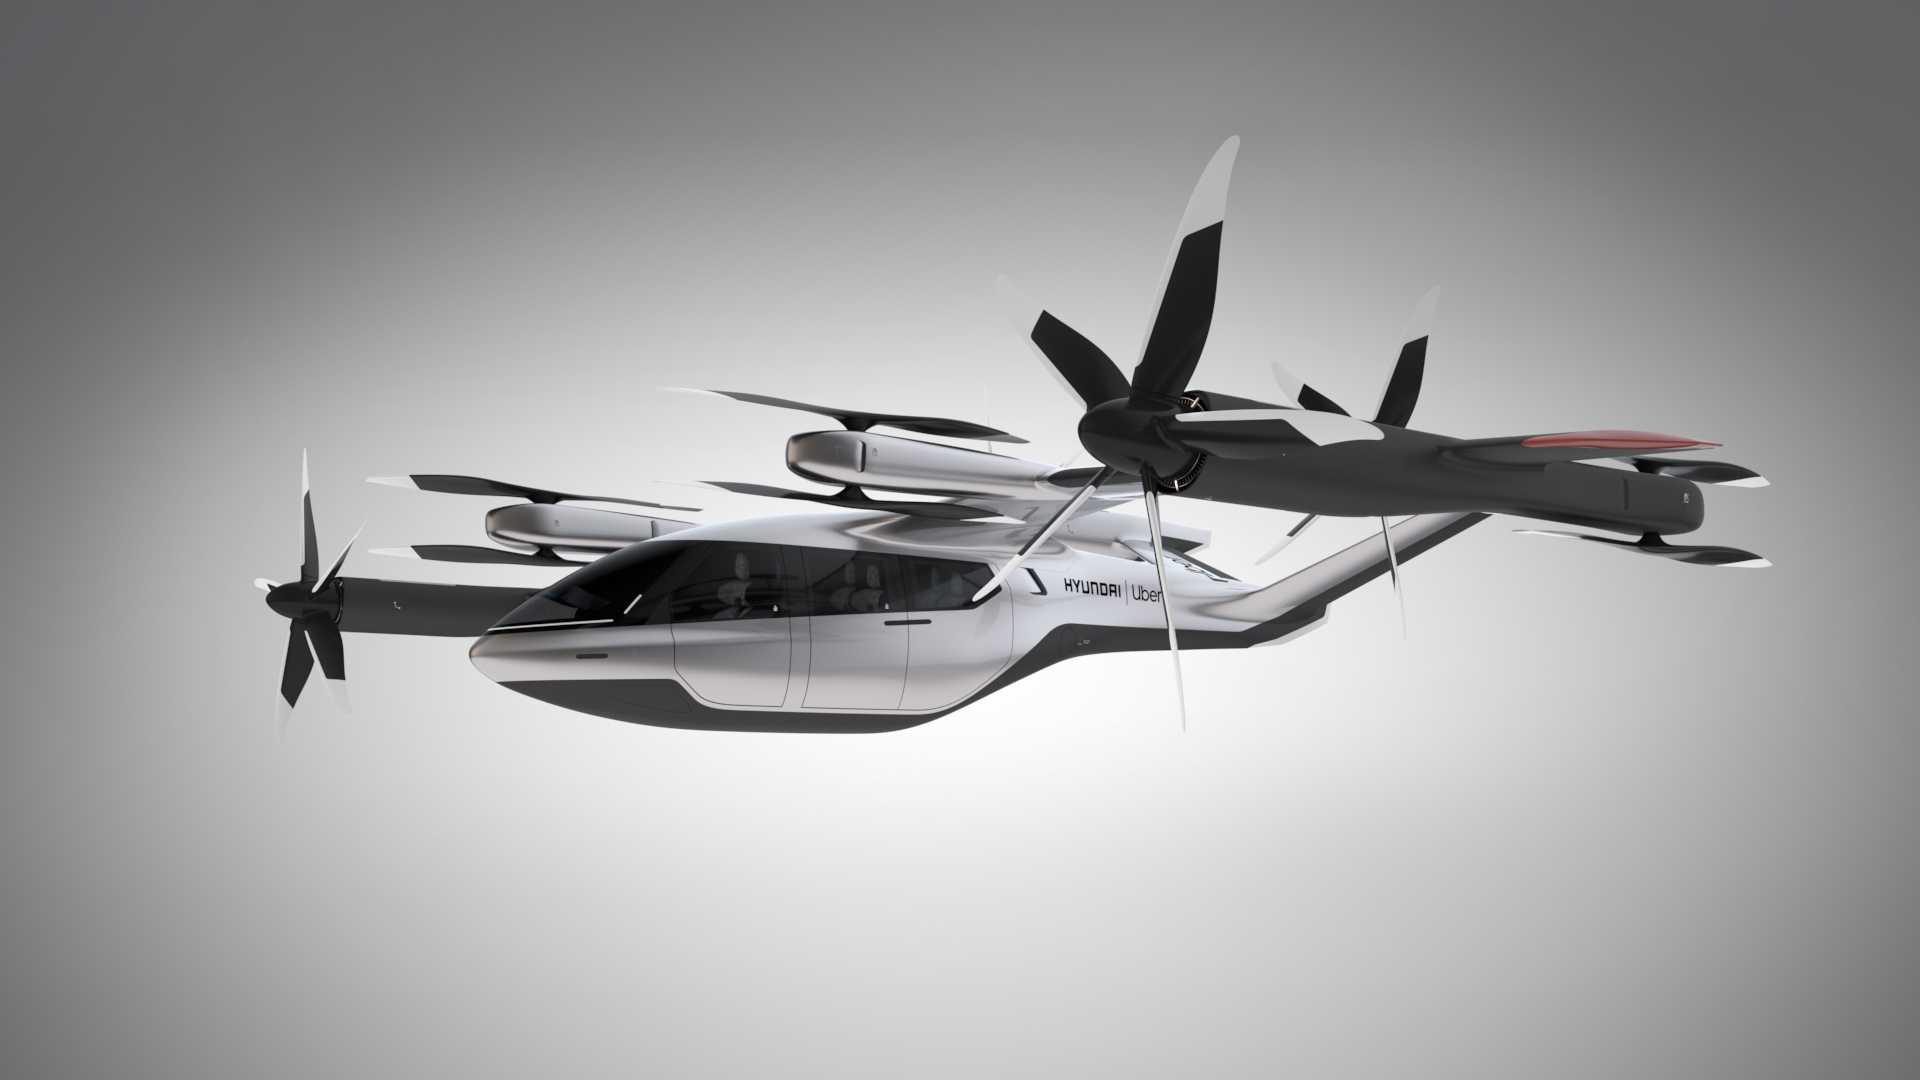 hyundai-uber-ridshare-air-taxi-concept-4